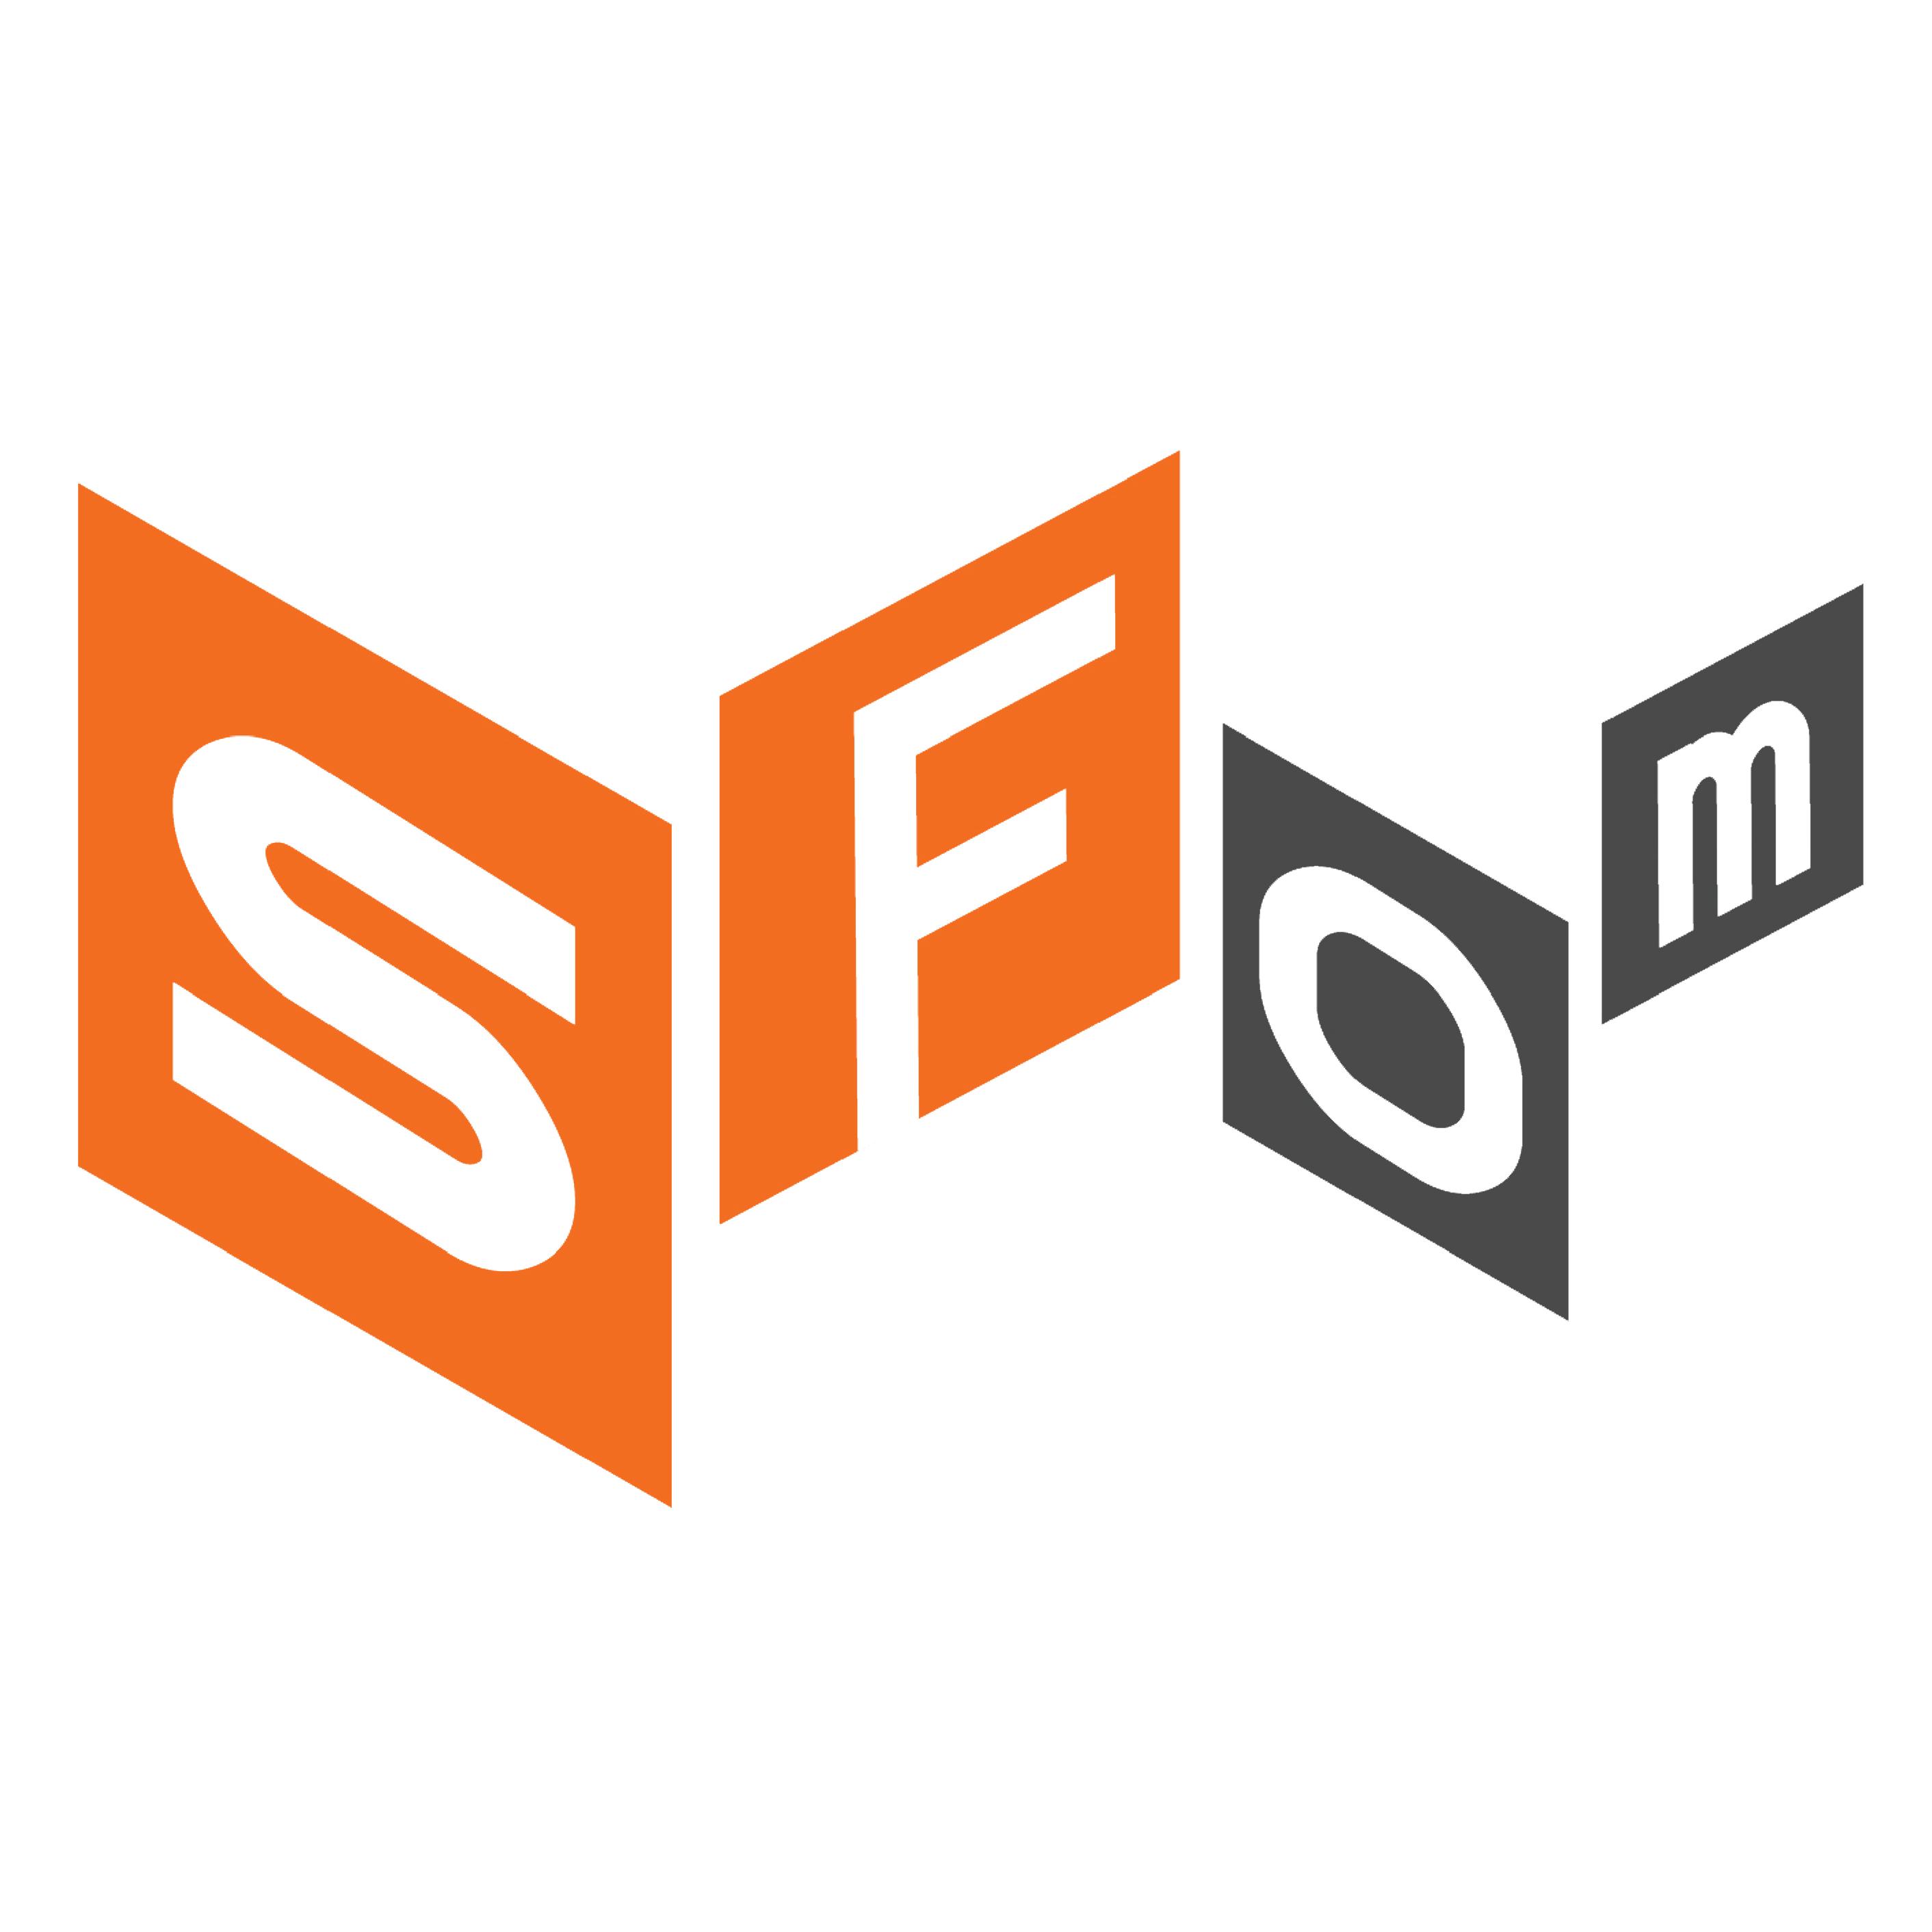 San Francisco Online Marketing - SFOM